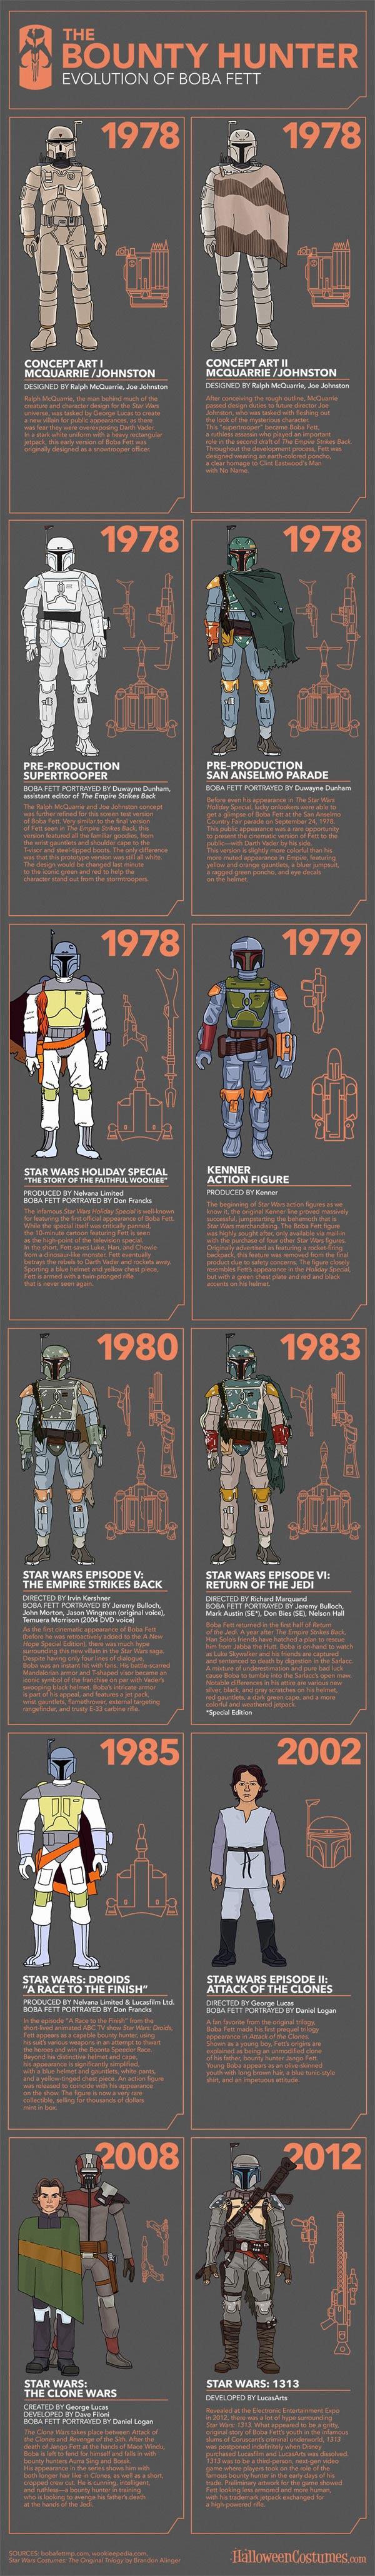 The Mandalorian Timeline : mandalorian bounty hunters the evolution of boba fett ~ Pogadajmy.info Styles, Décorations et Voitures